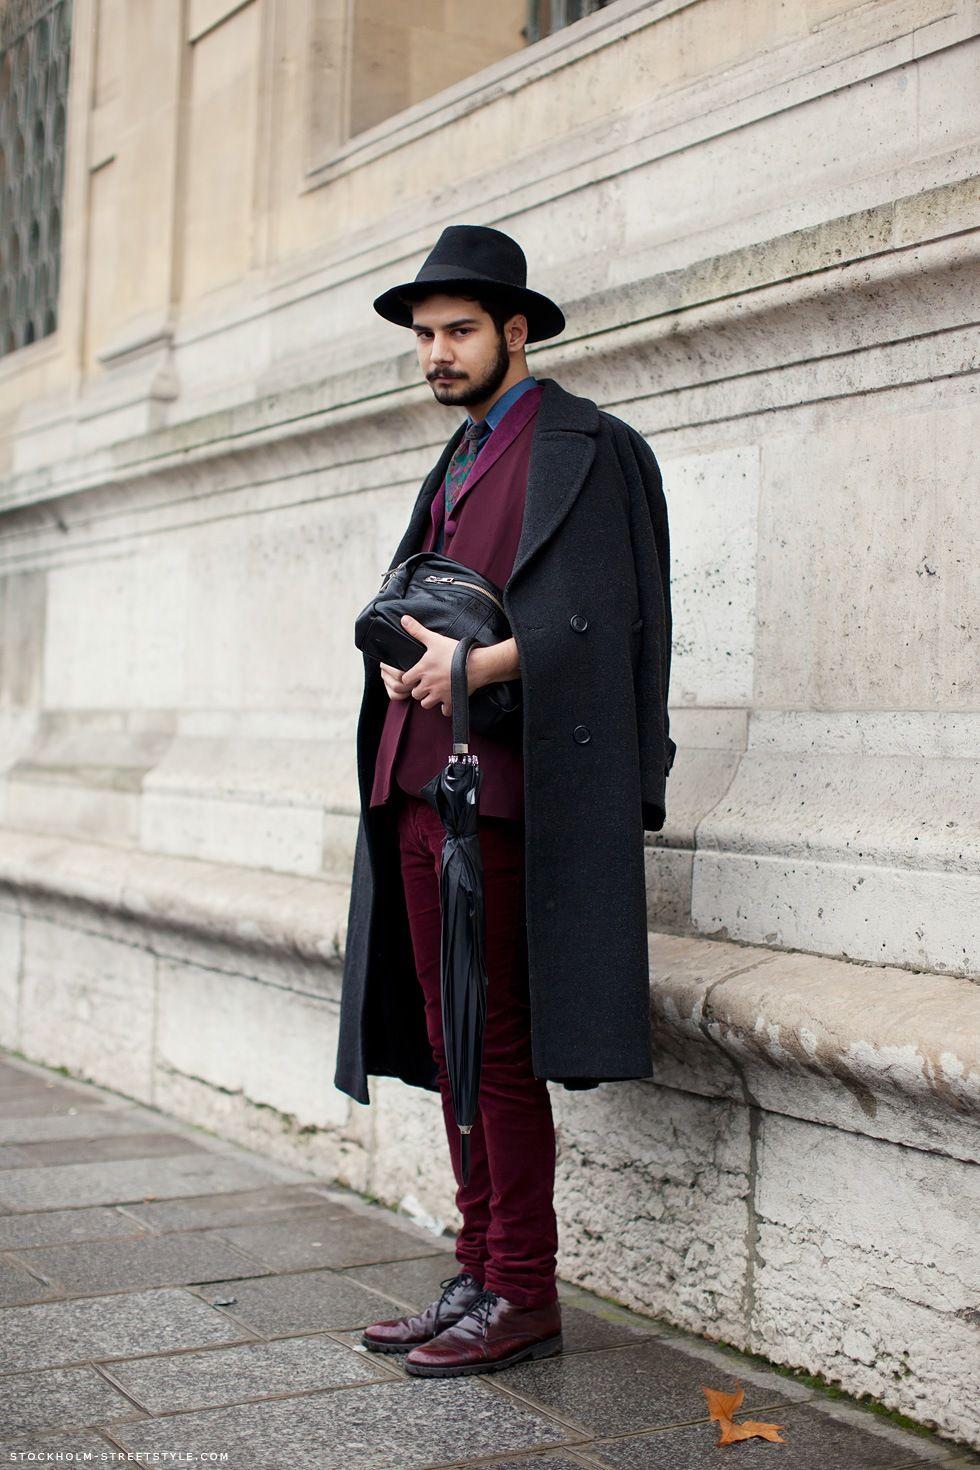 #musthave #menswear #inspiration #styleformen #mensfashion #men #fashion #dope #gentlemen #male #mensclothing #ootd #almejada